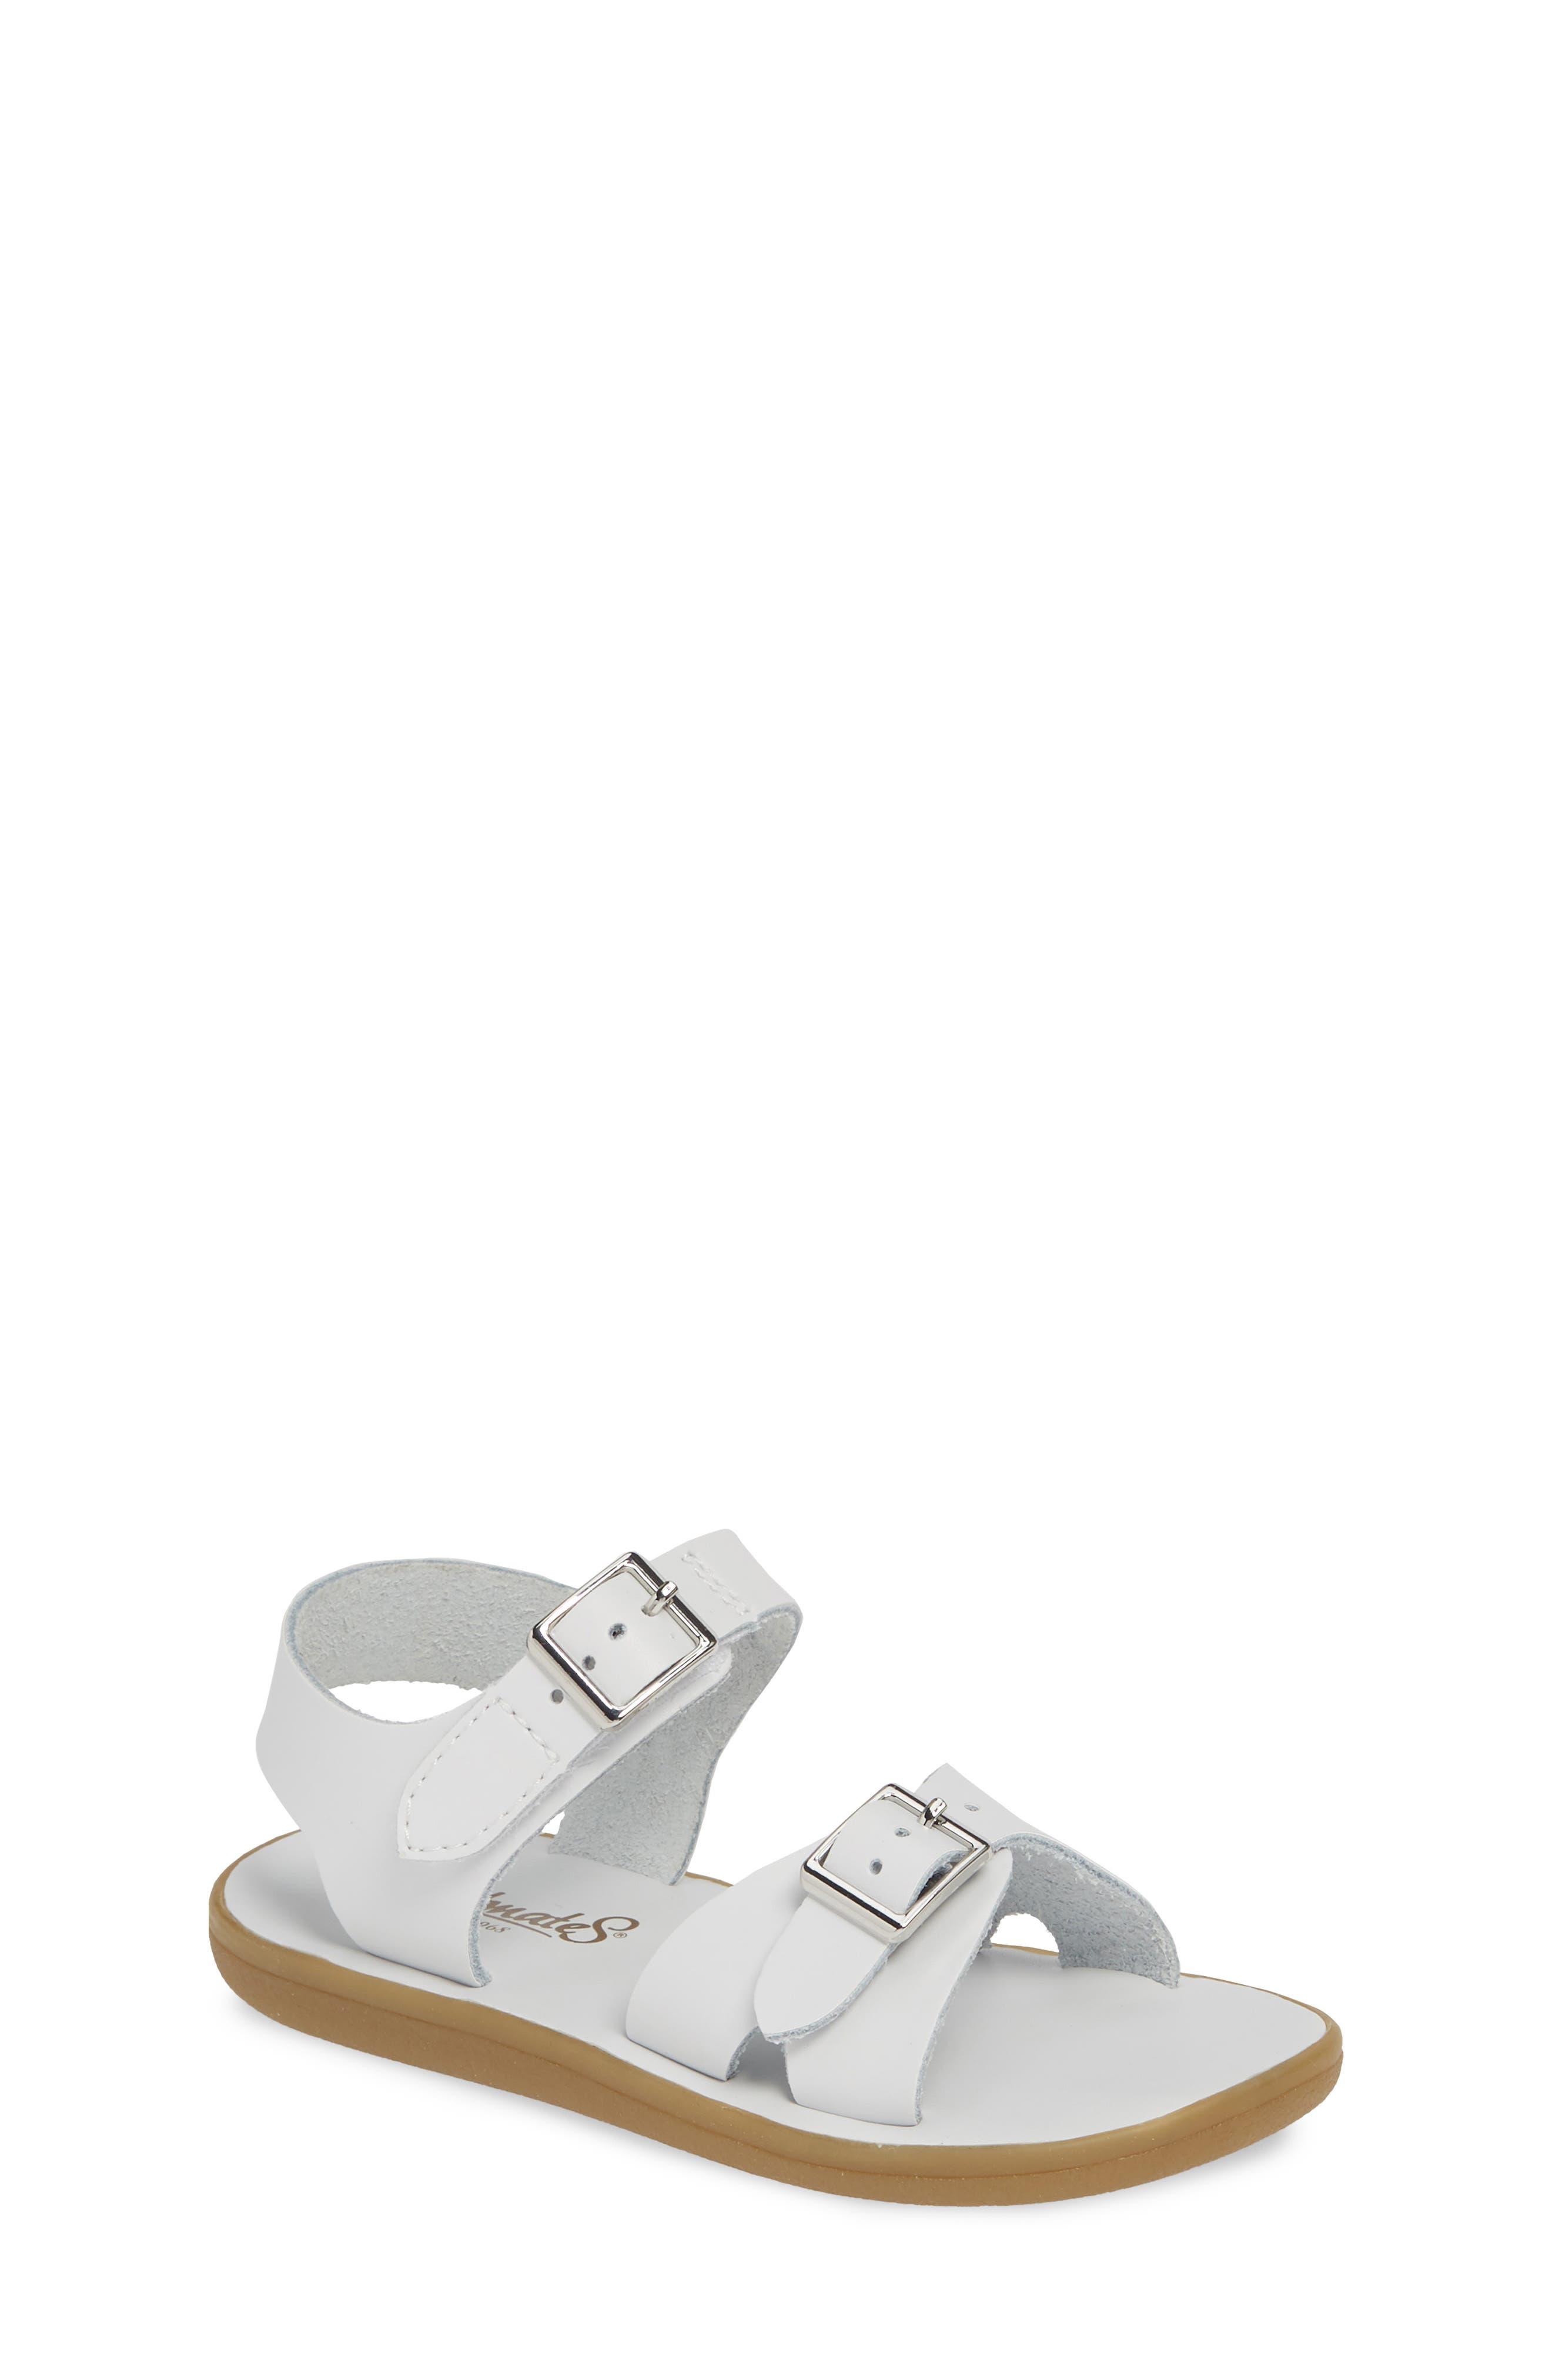 FOOTMATES, Tide Waterproof Sandal, Main thumbnail 1, color, WHITE